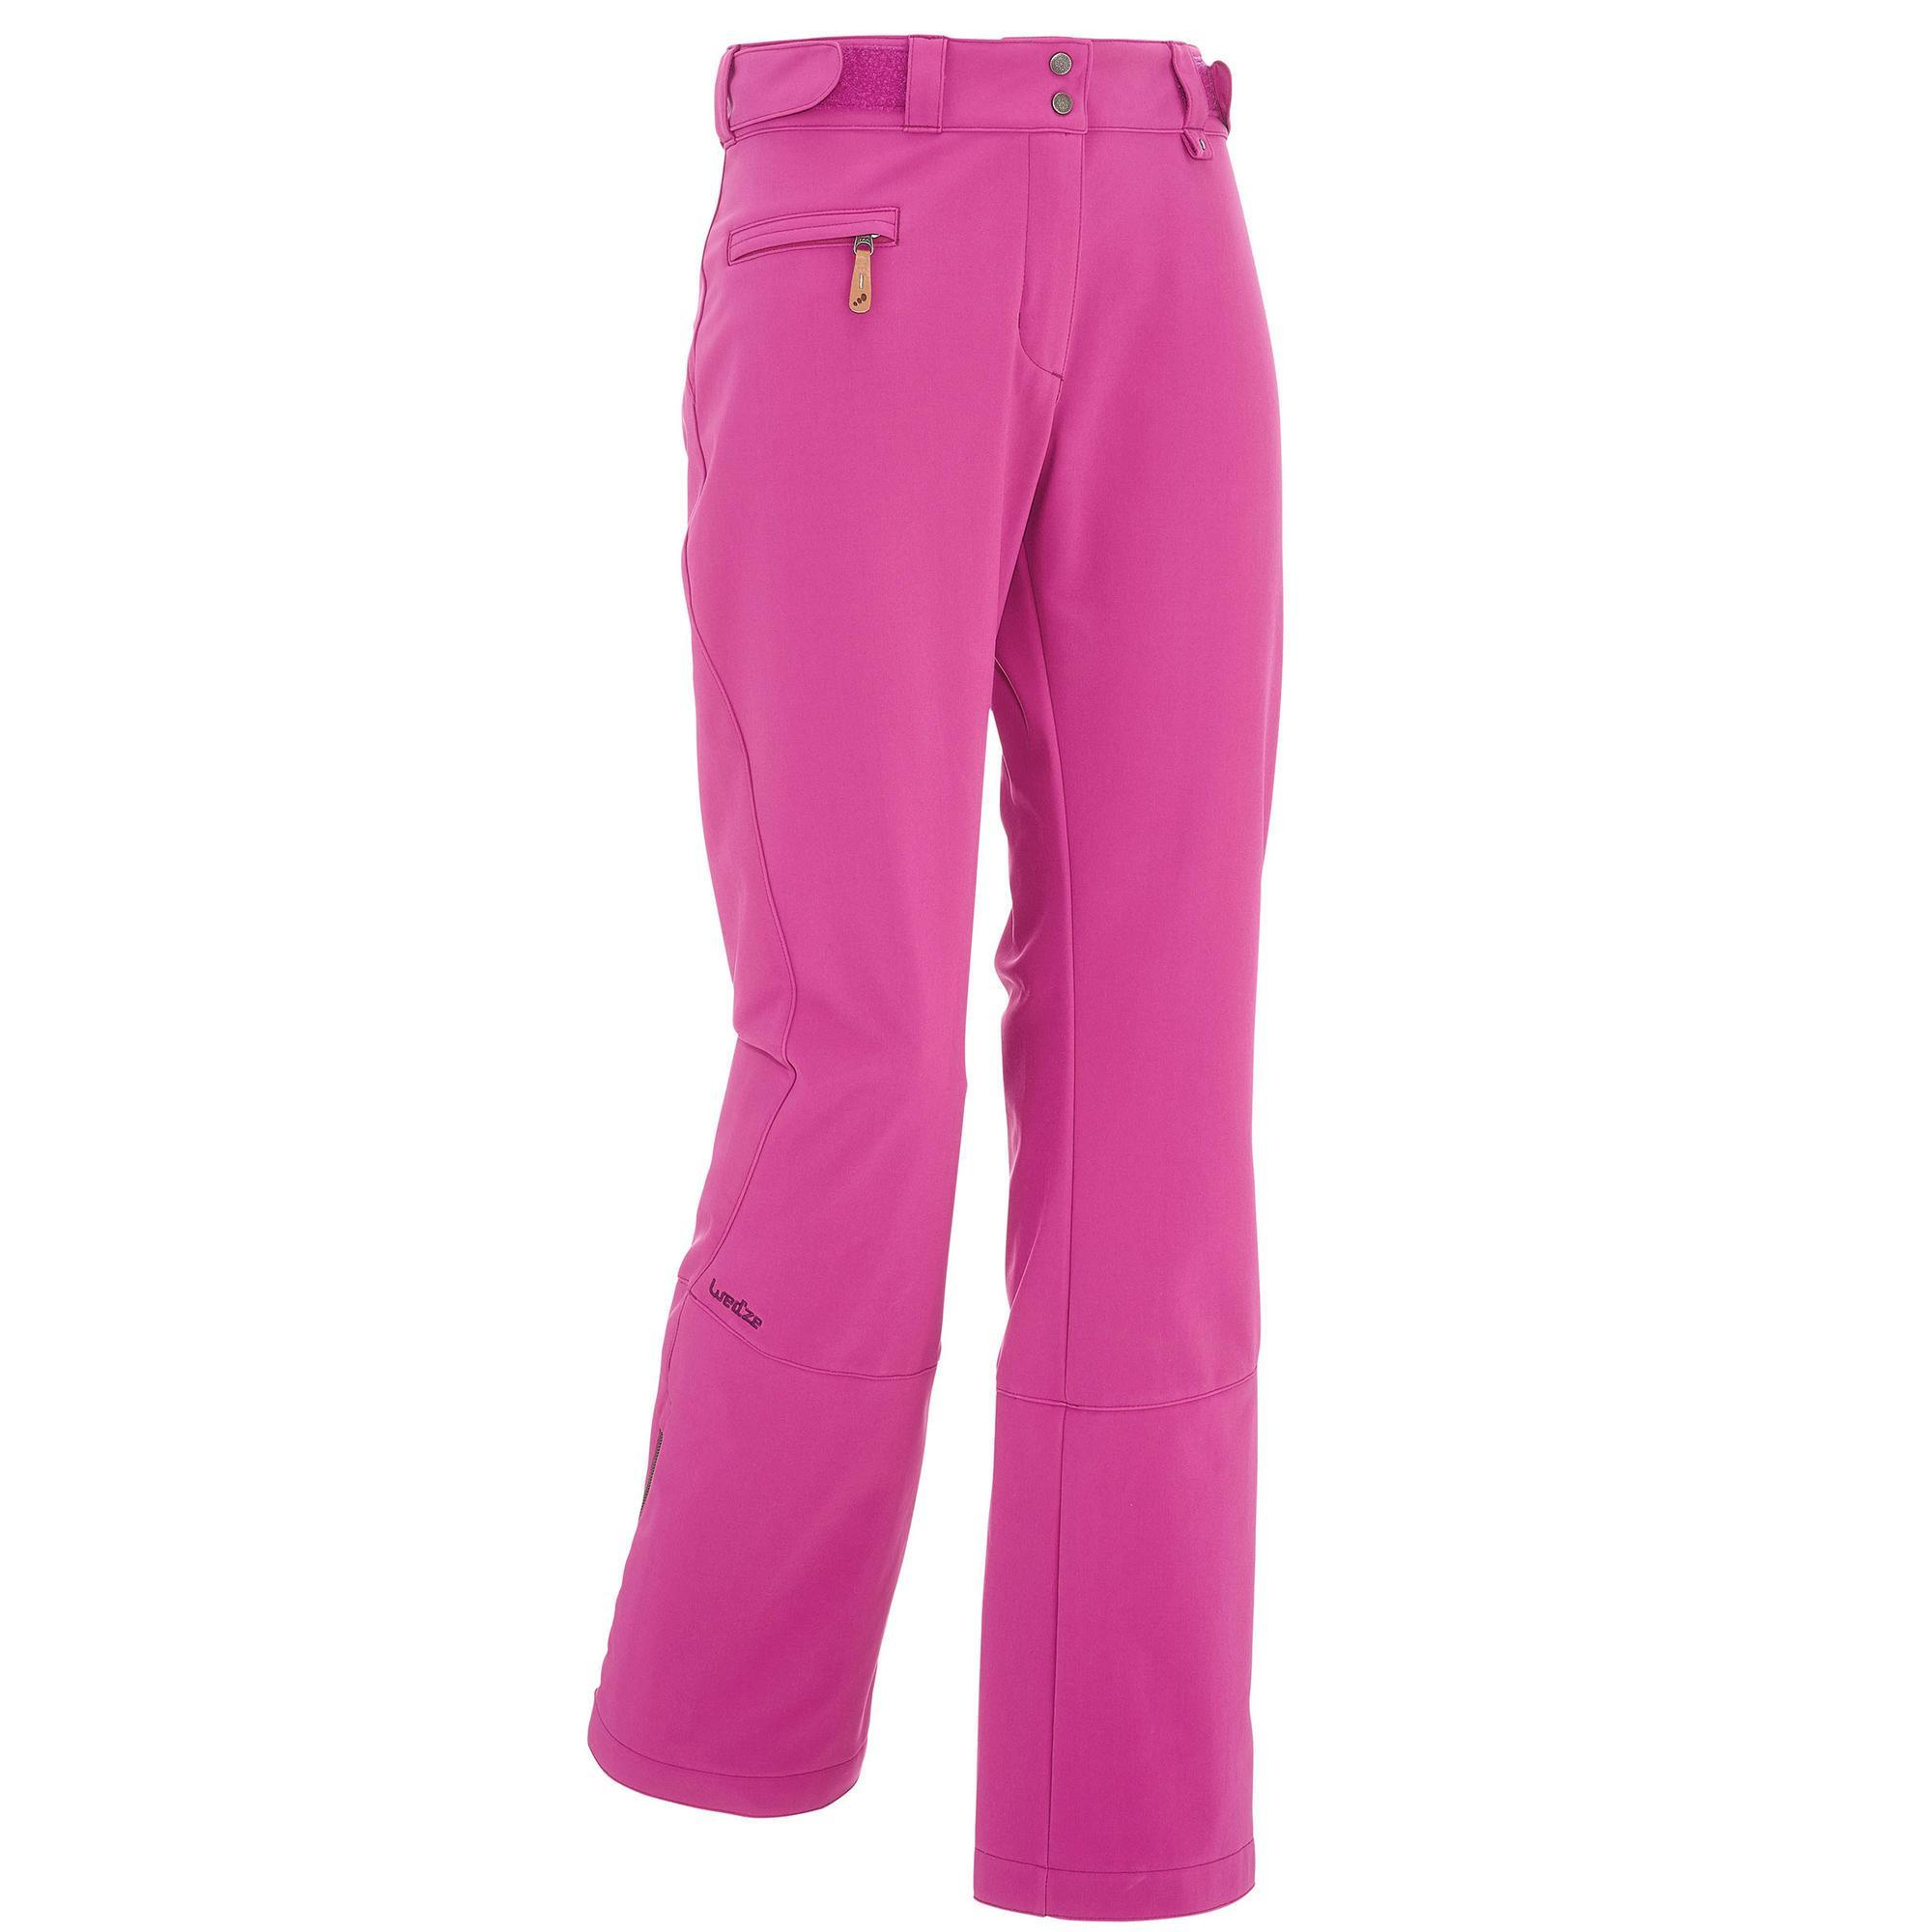 Pantalon ski femme slide 500 violet wedze